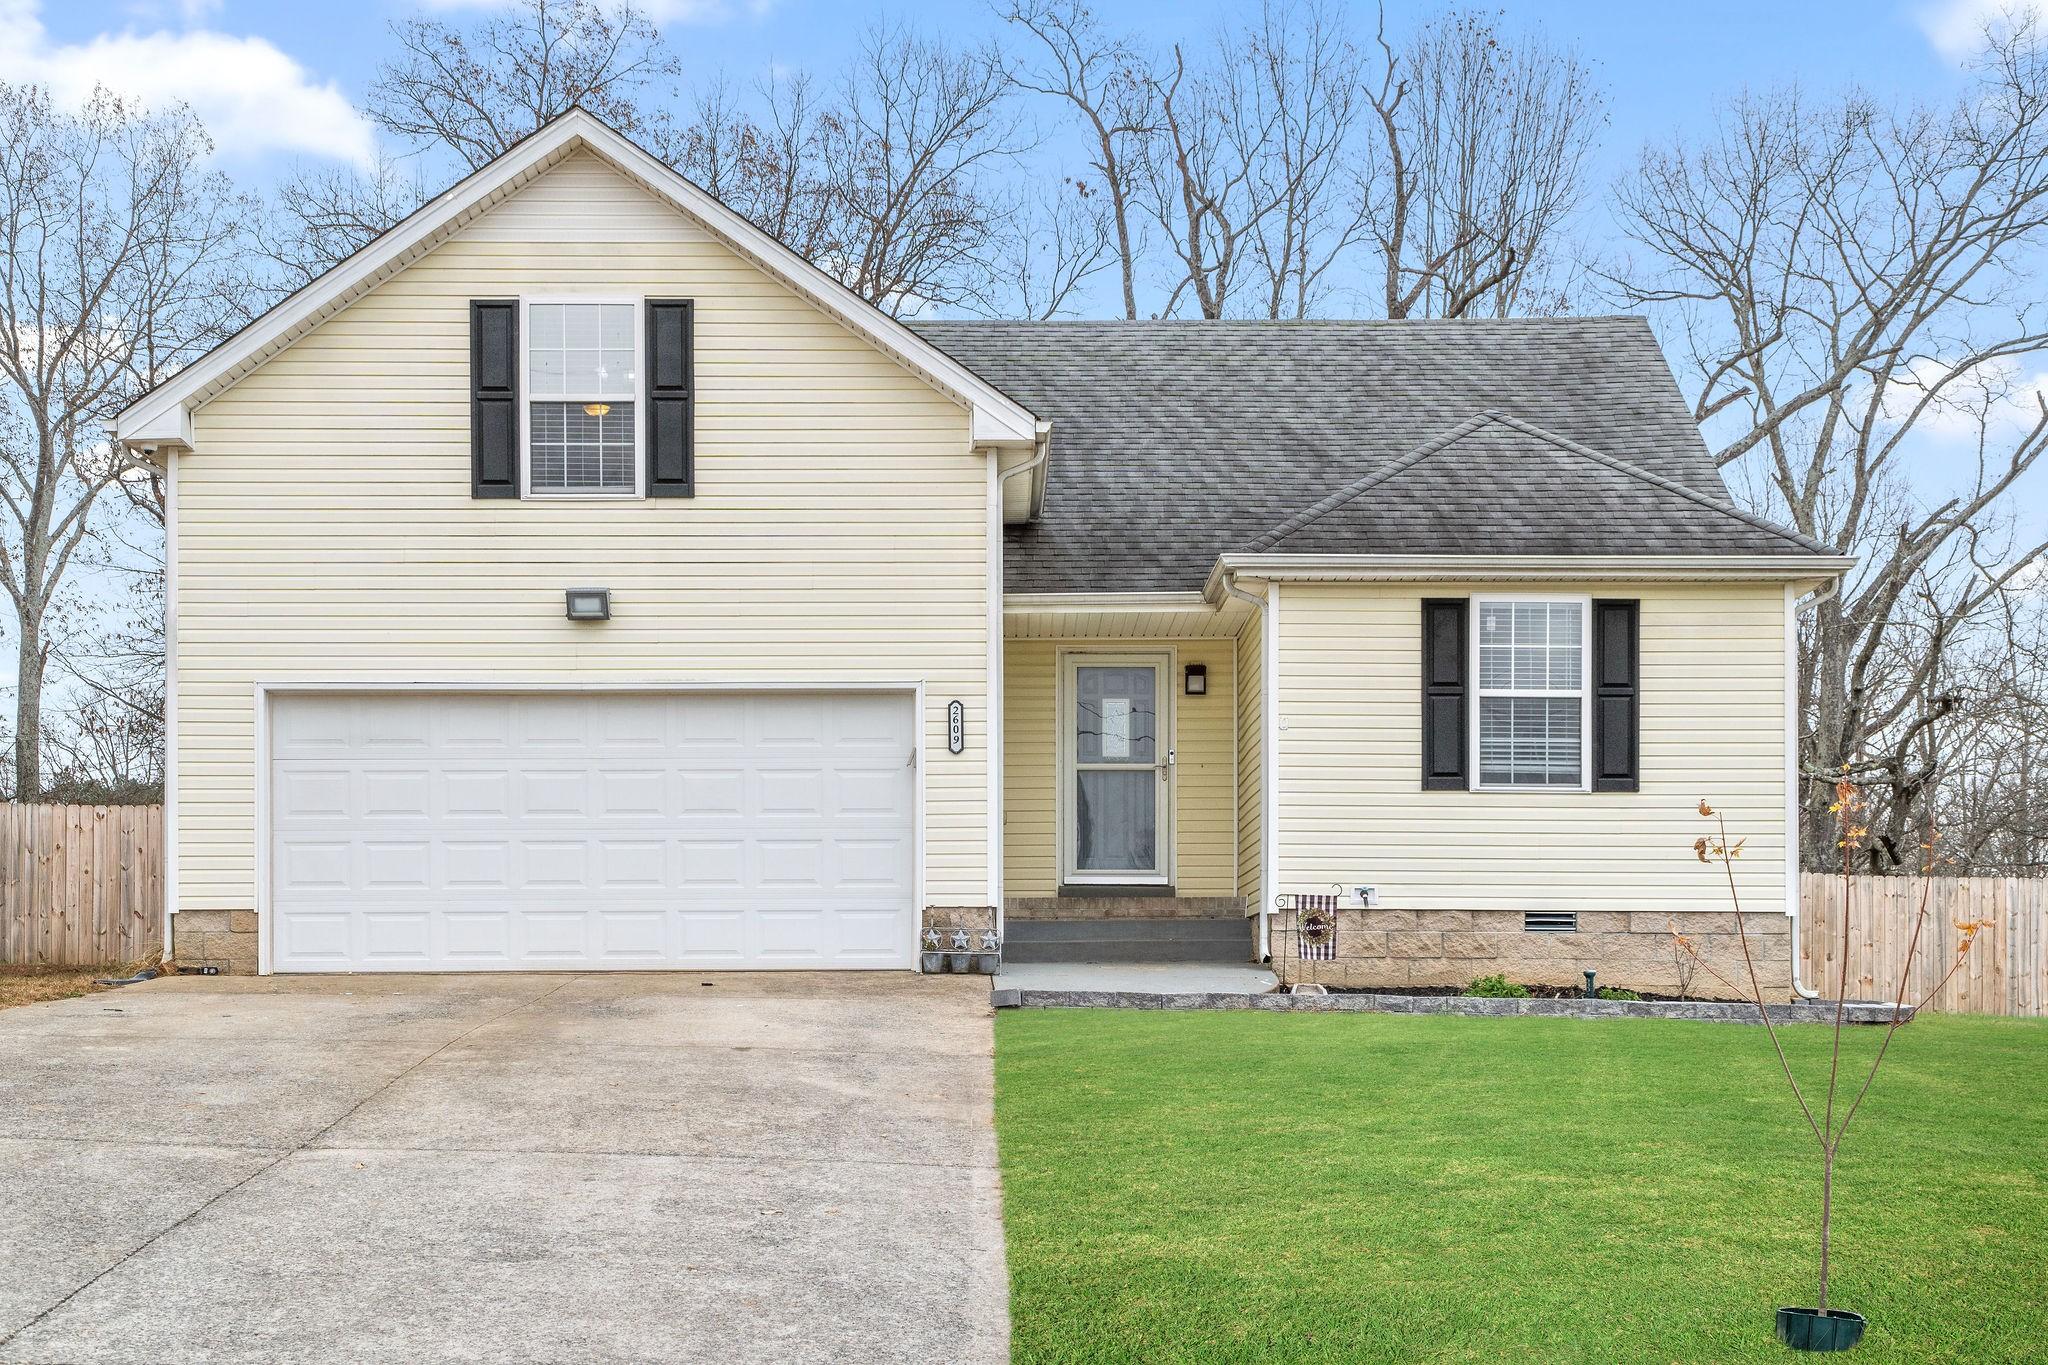 2609 Peach Grove Ln Property Photo - Woodlawn, TN real estate listing